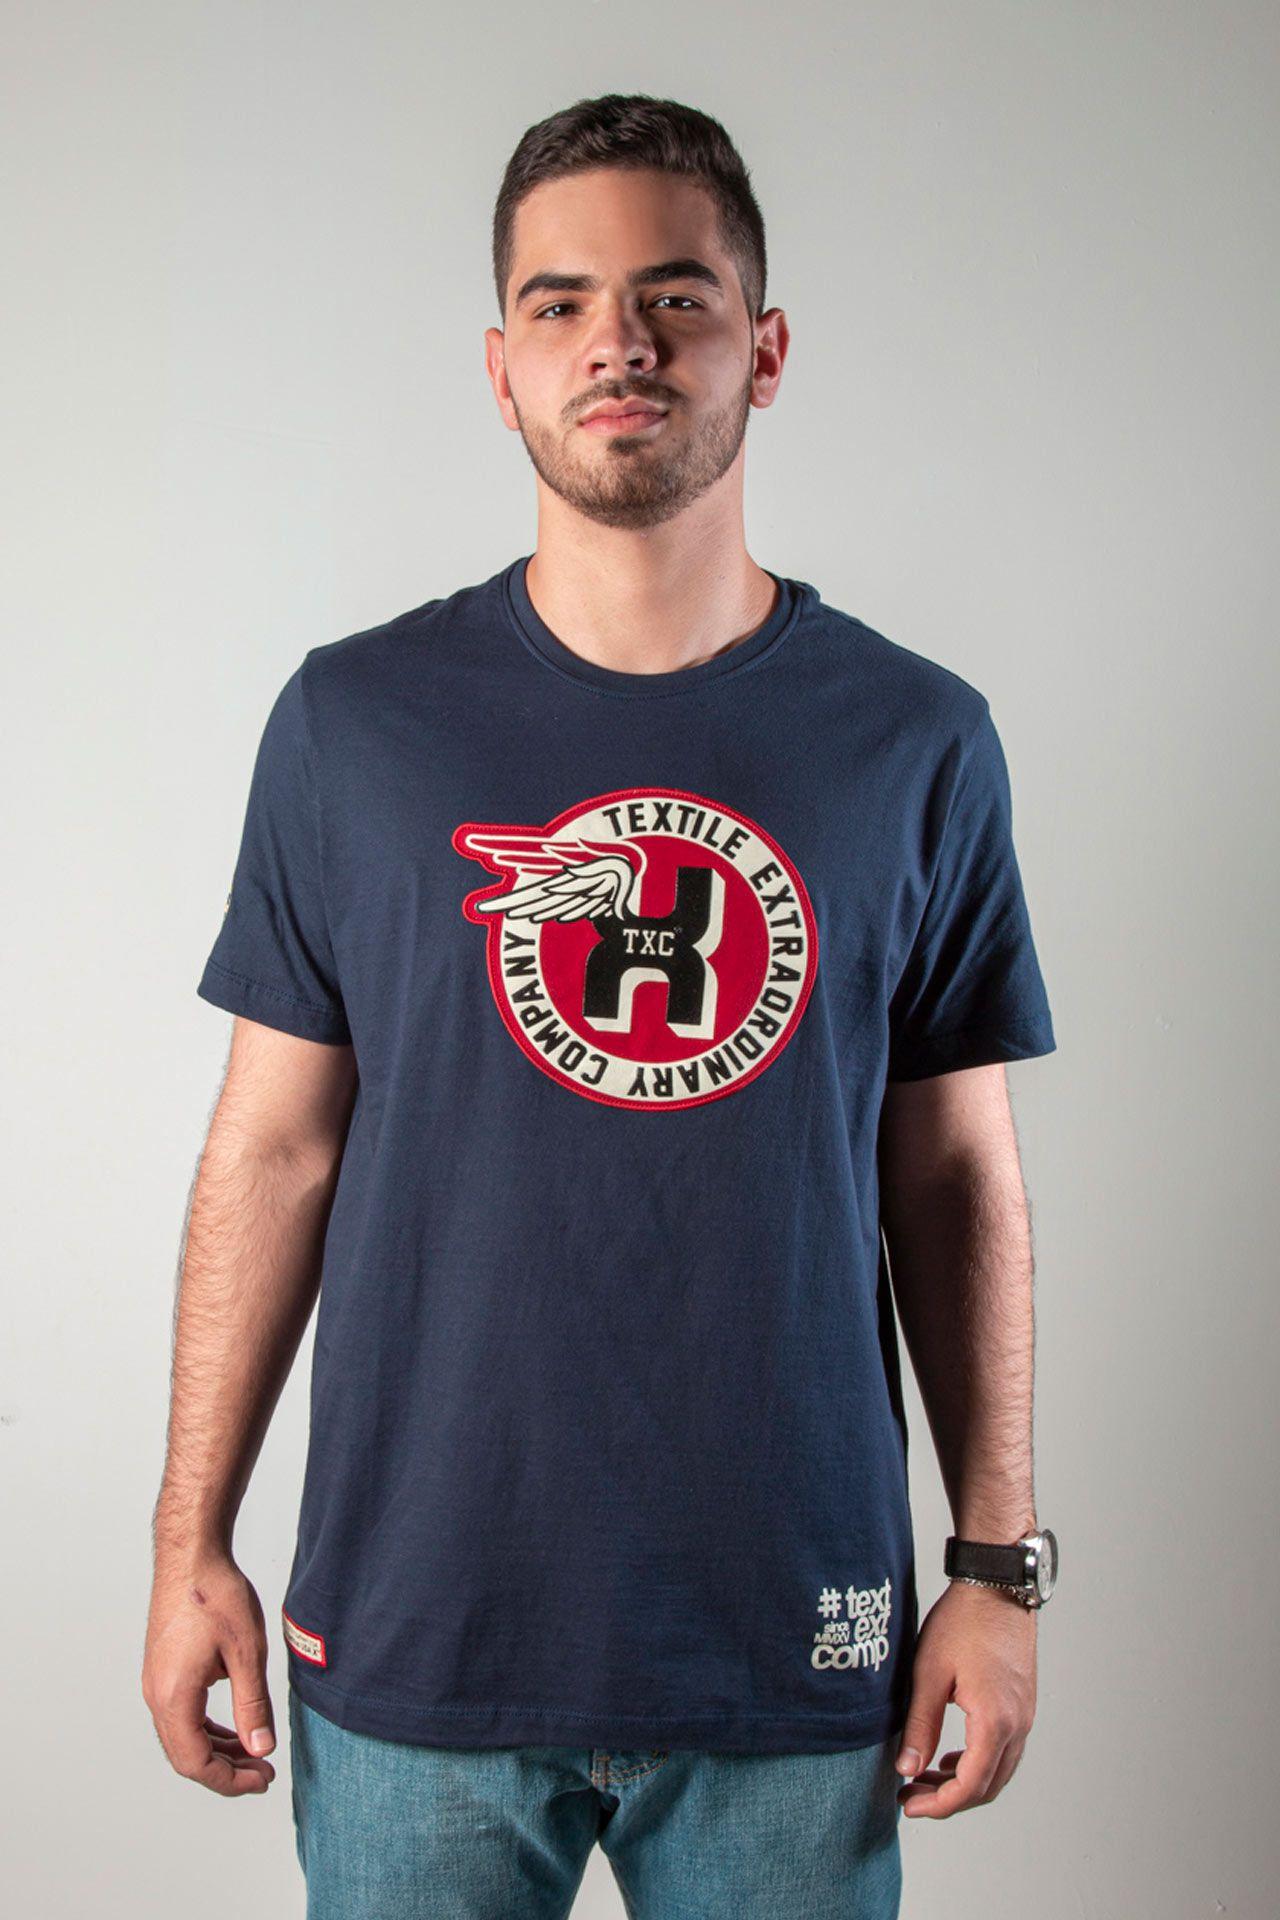 Camiseta Masculina TXC 1963